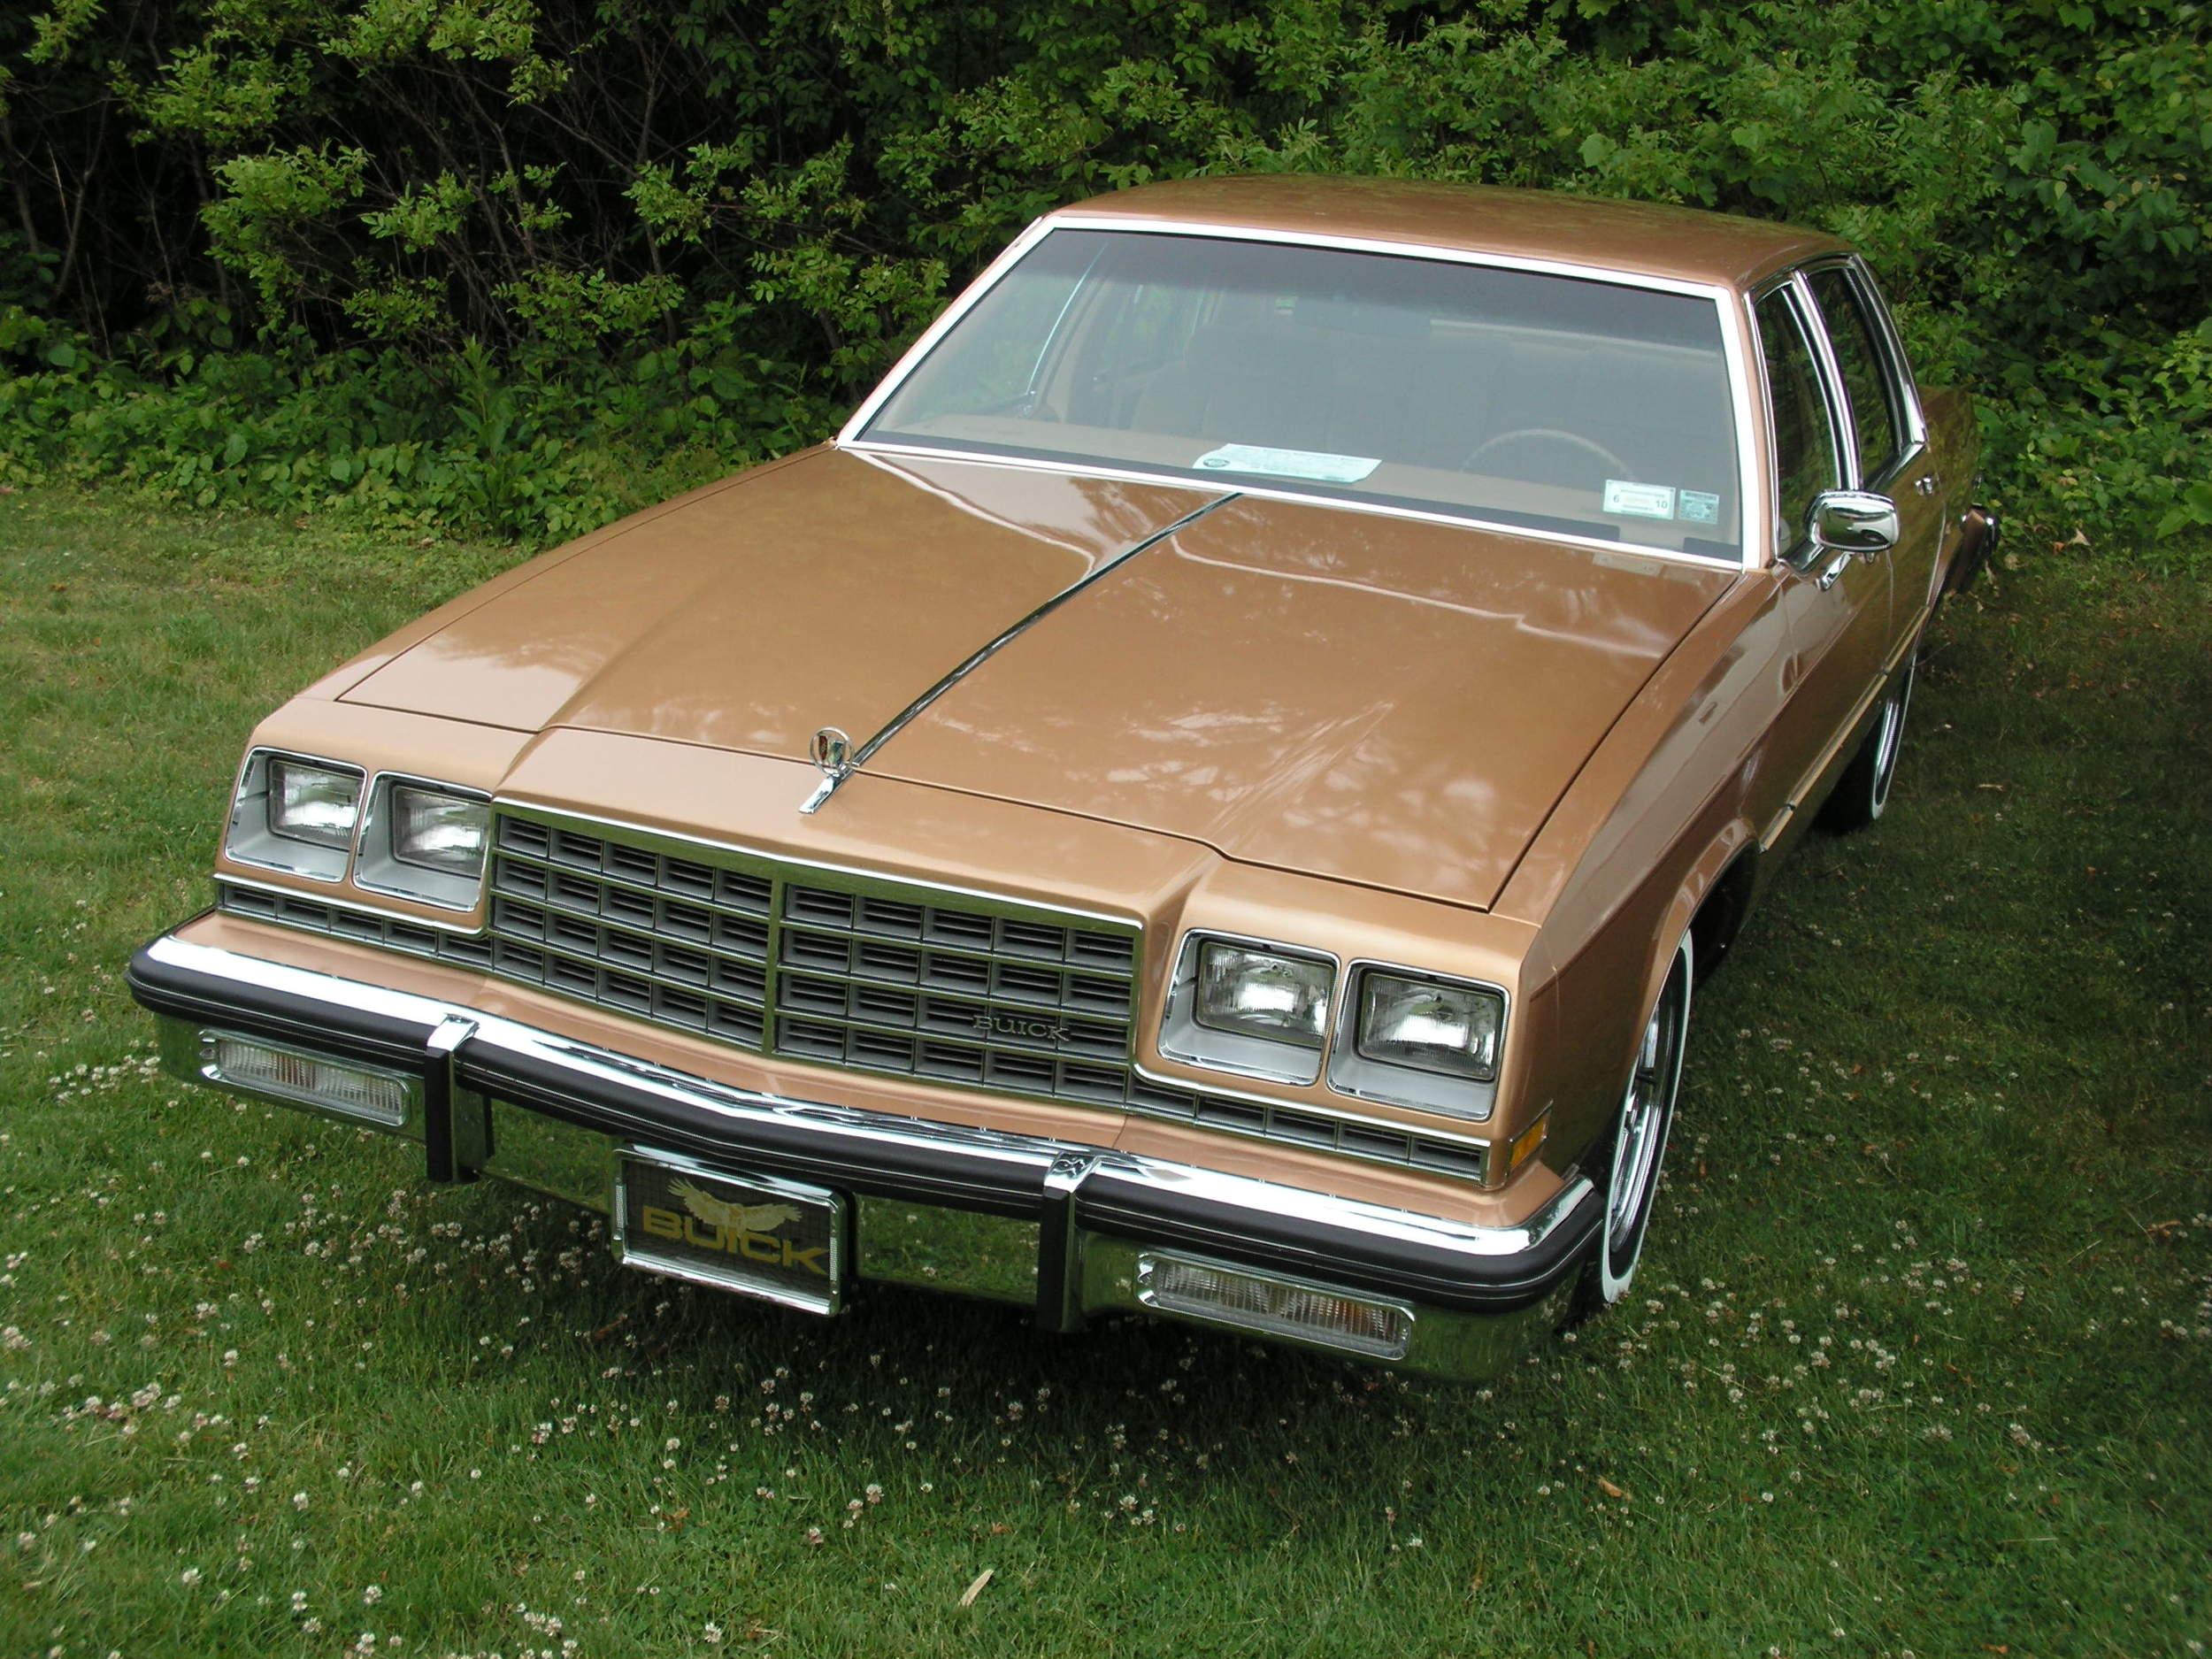 Andy Kollos: 1980 LeSabre Limited Sedan